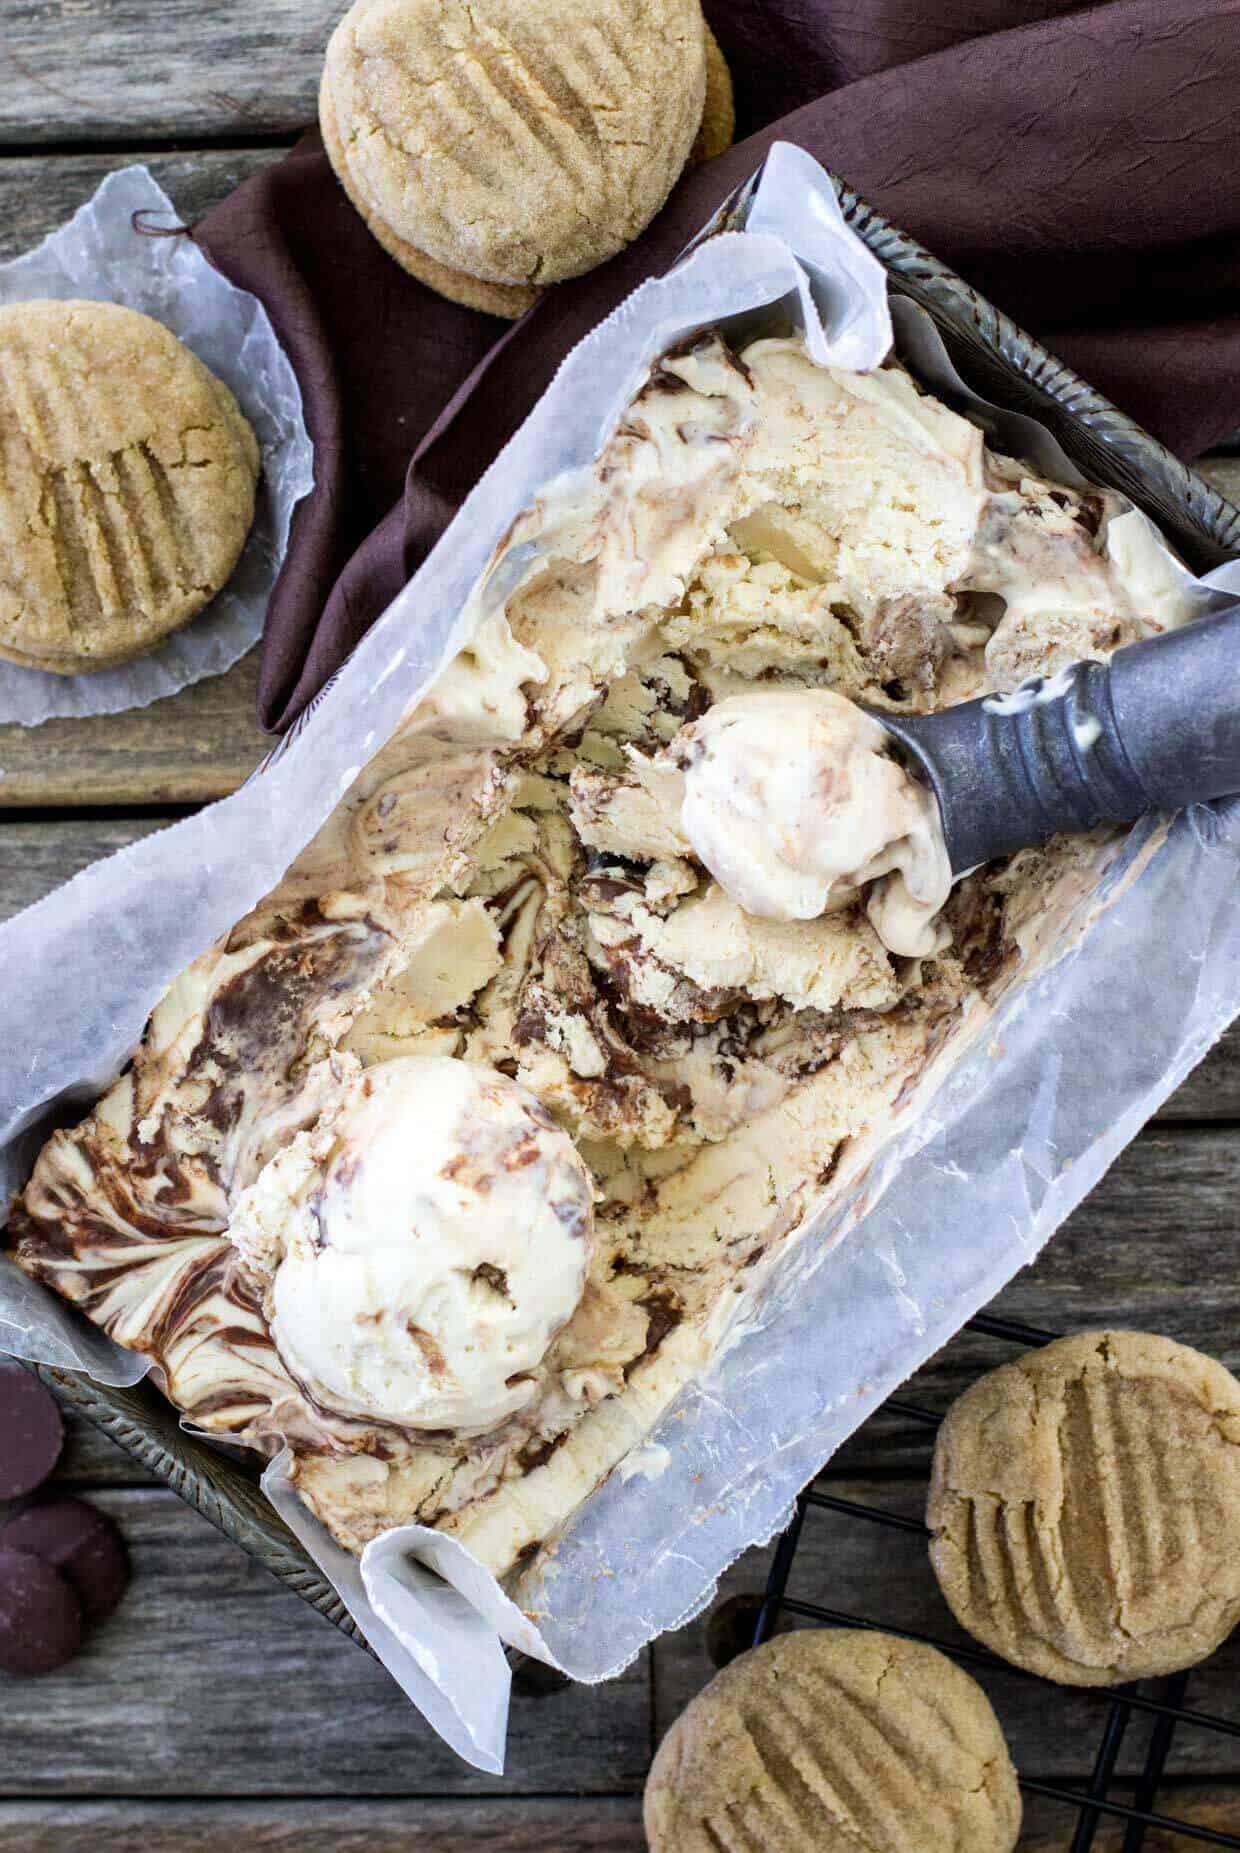 Peanut Butter Chocolate Swirl Ice Cream Cookie Sandwiches